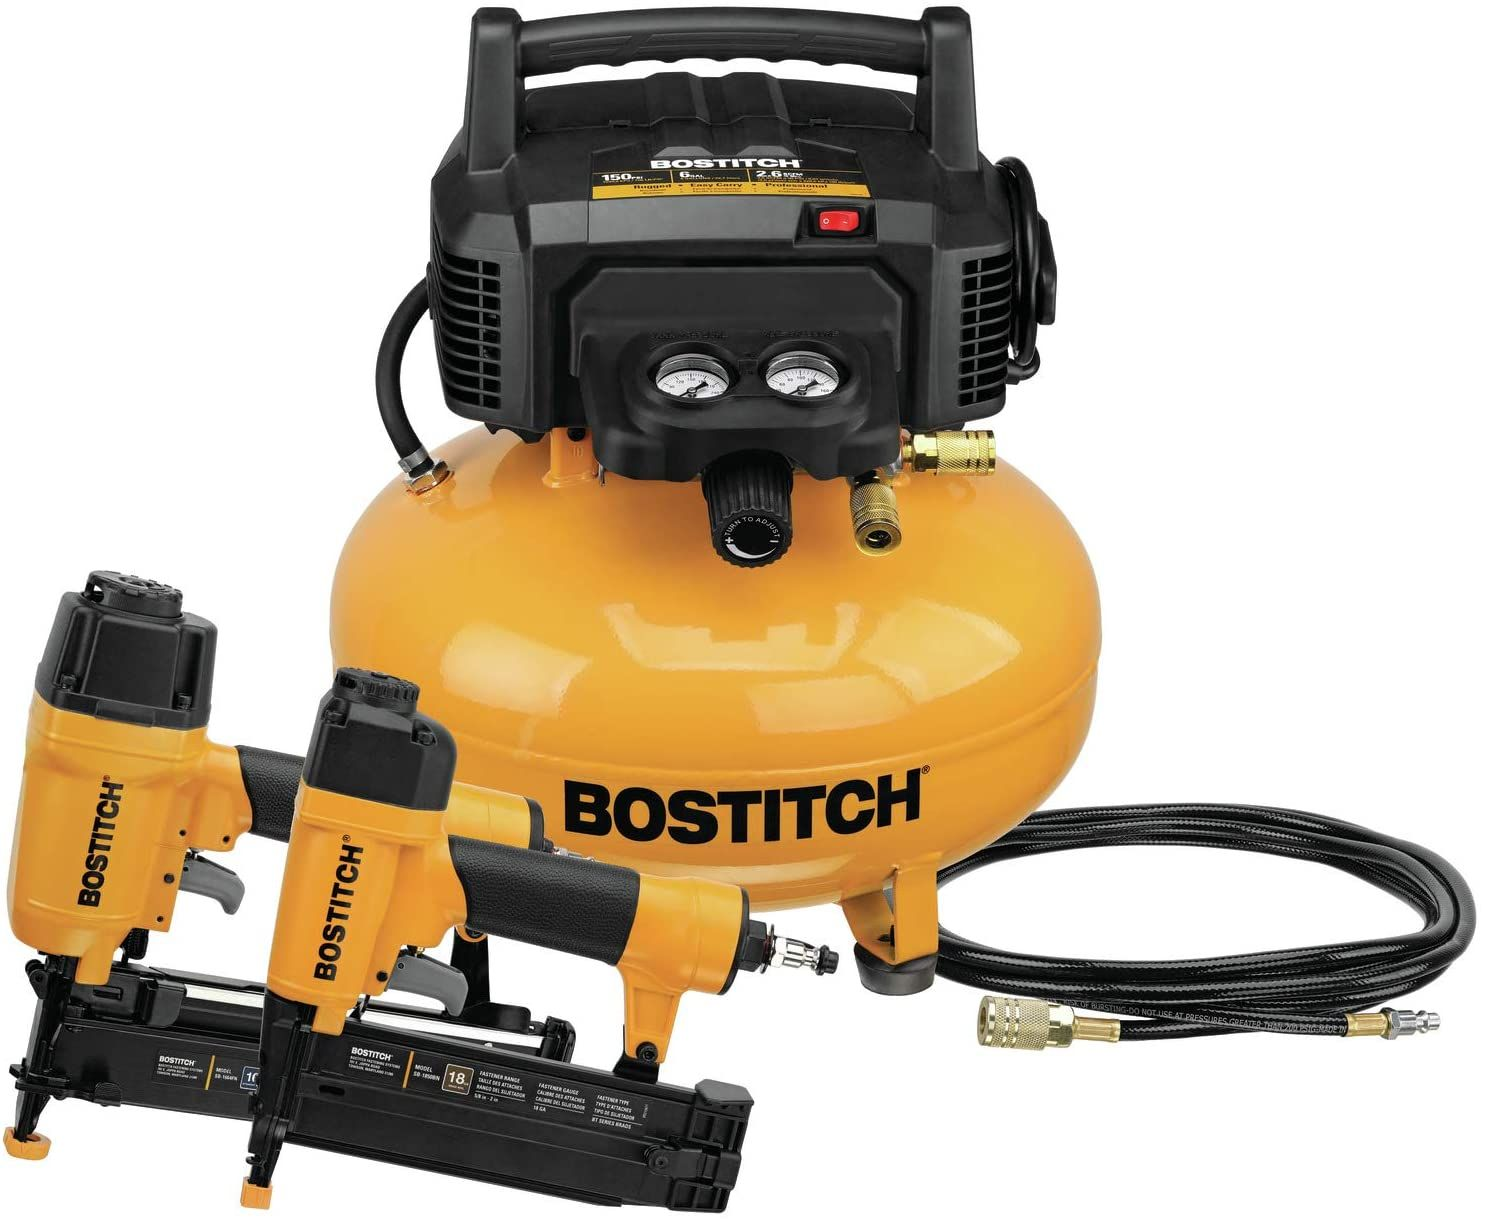 BOSTITCH Pancake Air Compressor 6 Gallon in 2020 Combo